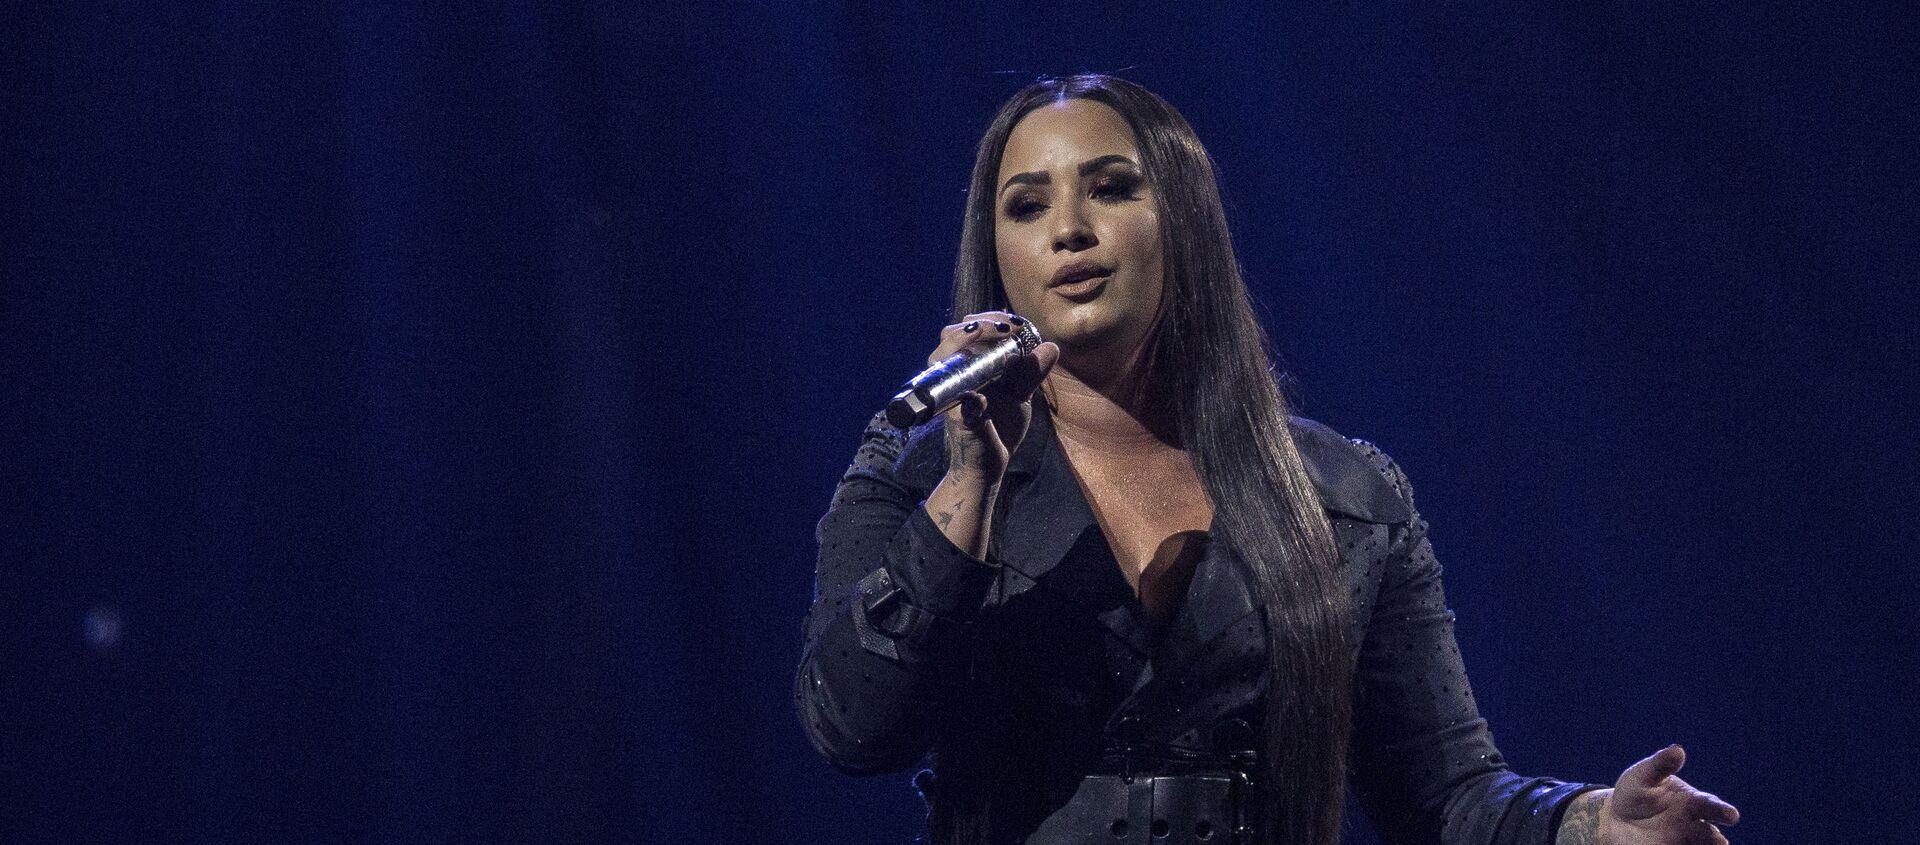 Demi Lovato, cantante estadounidense - Sputnik Mundo, 1920, 20.09.2018